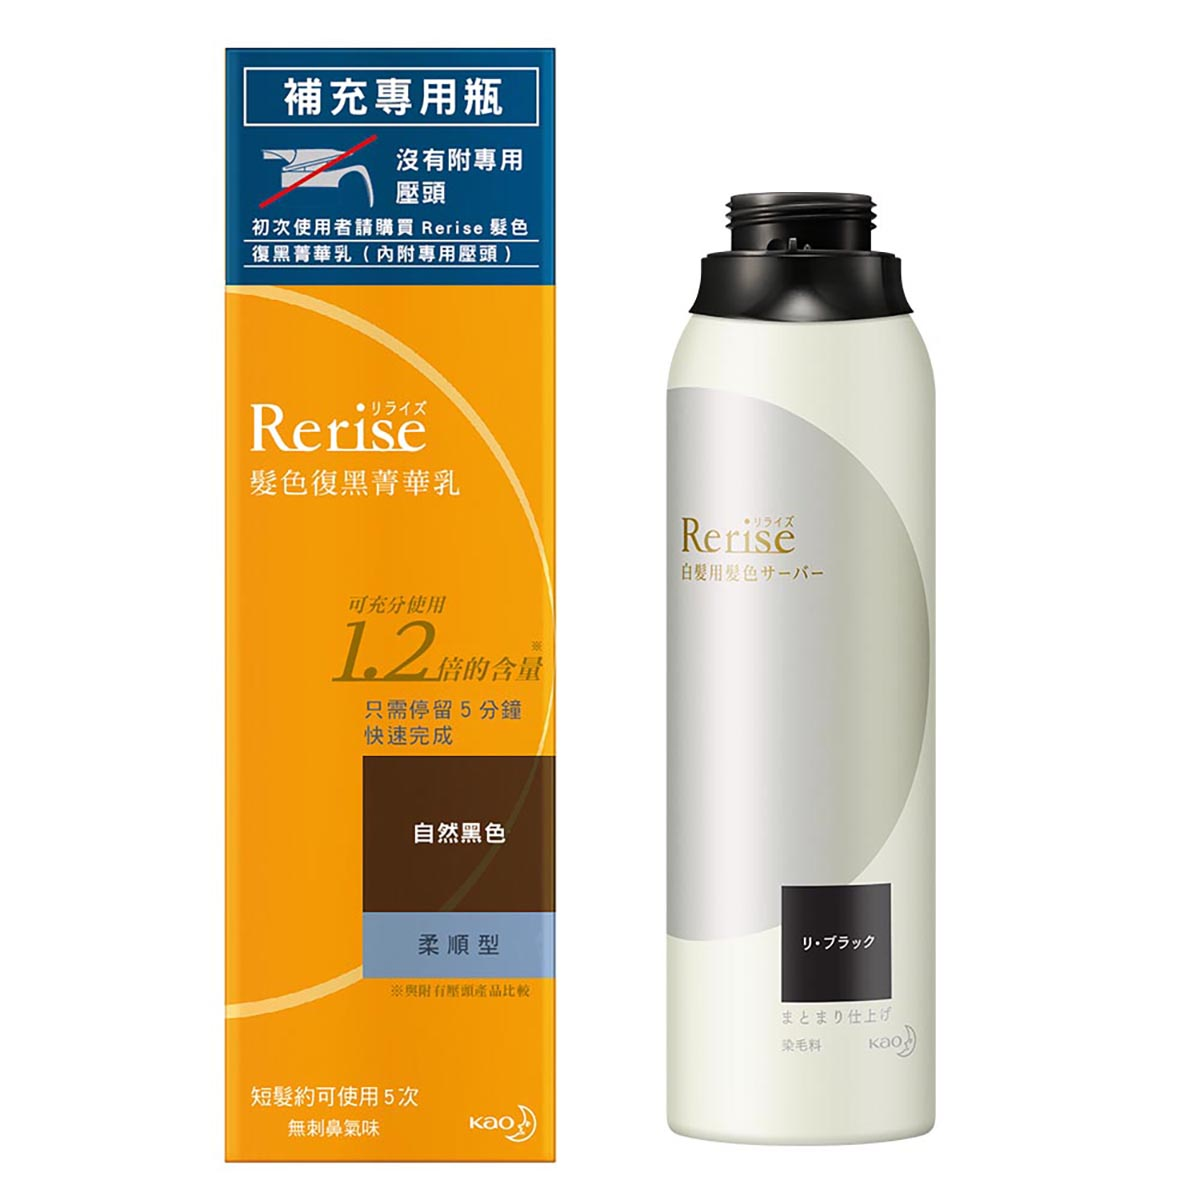 Rerise瑞絲髮色復黑菁華乳柔順型自然黑補充瓶190g